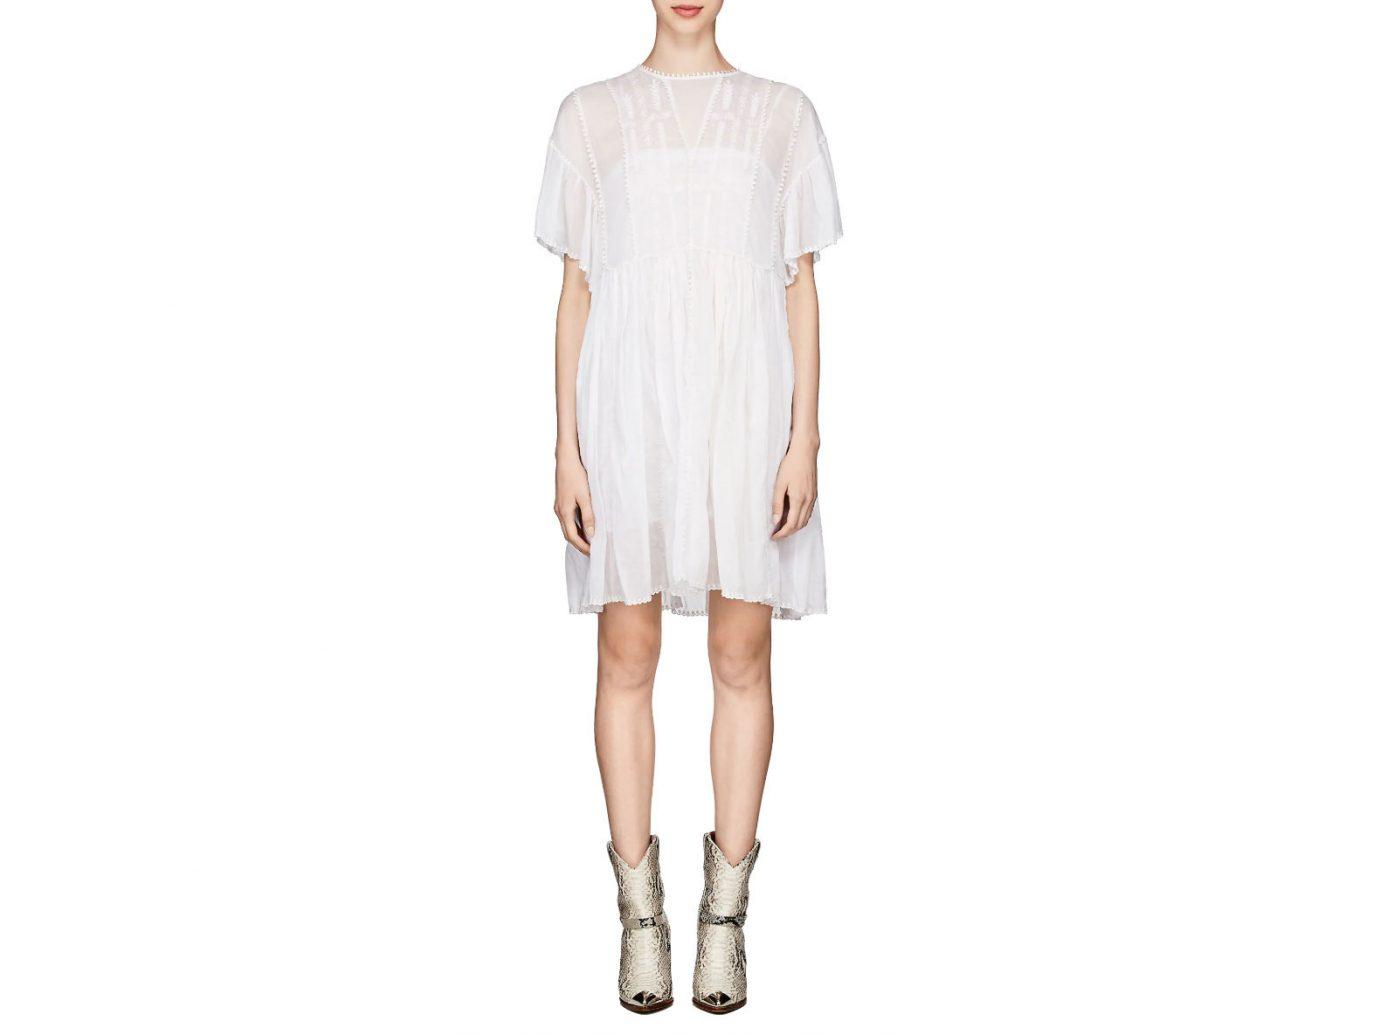 Isabel Marant Étoile Annaelle Embroidered Cotton Smock Dress